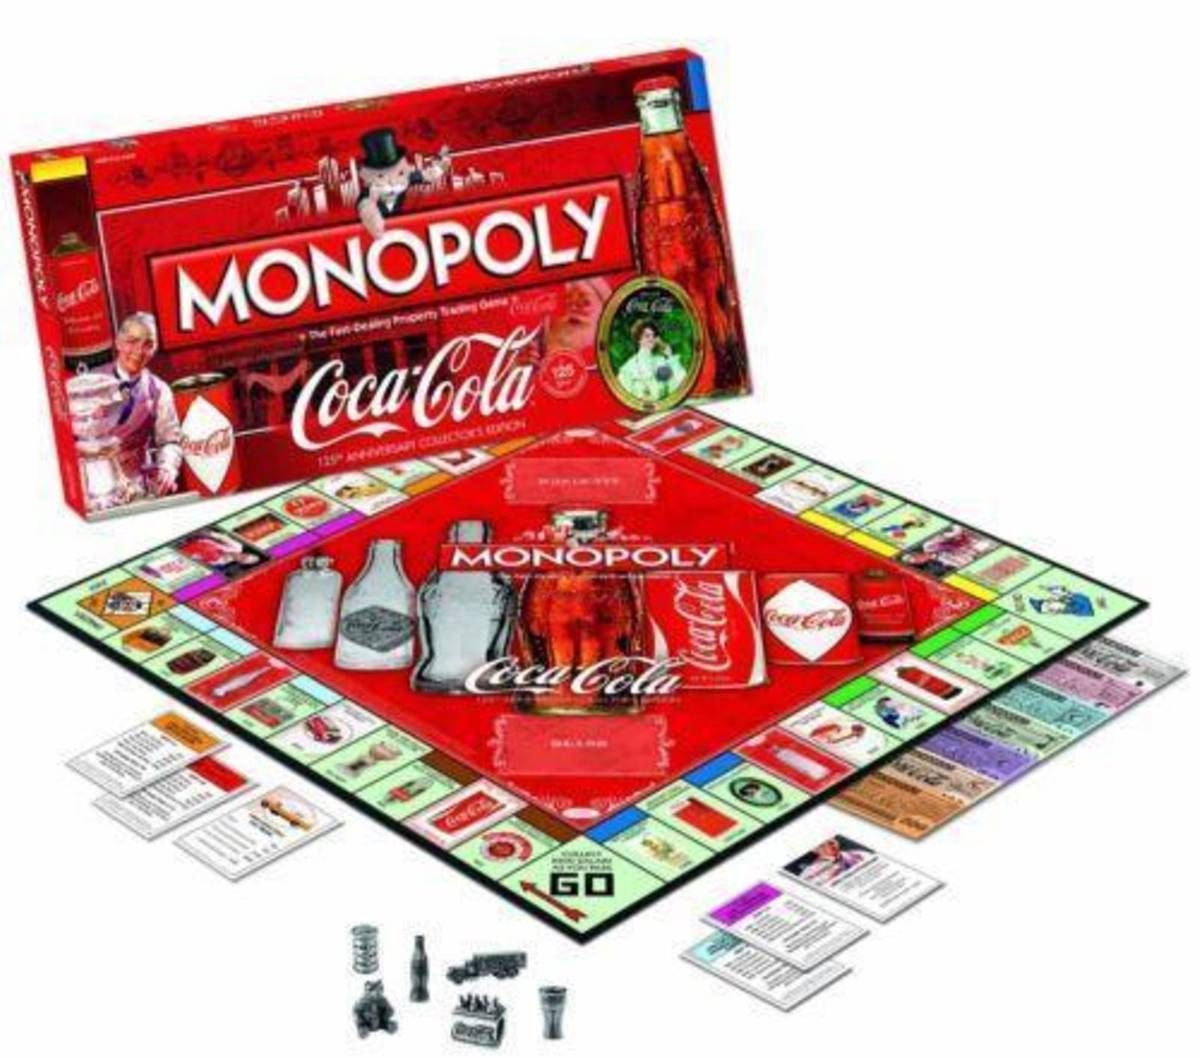 monopoly coca cola banco imobiliário colecionador raro - tabuleiro monopoly